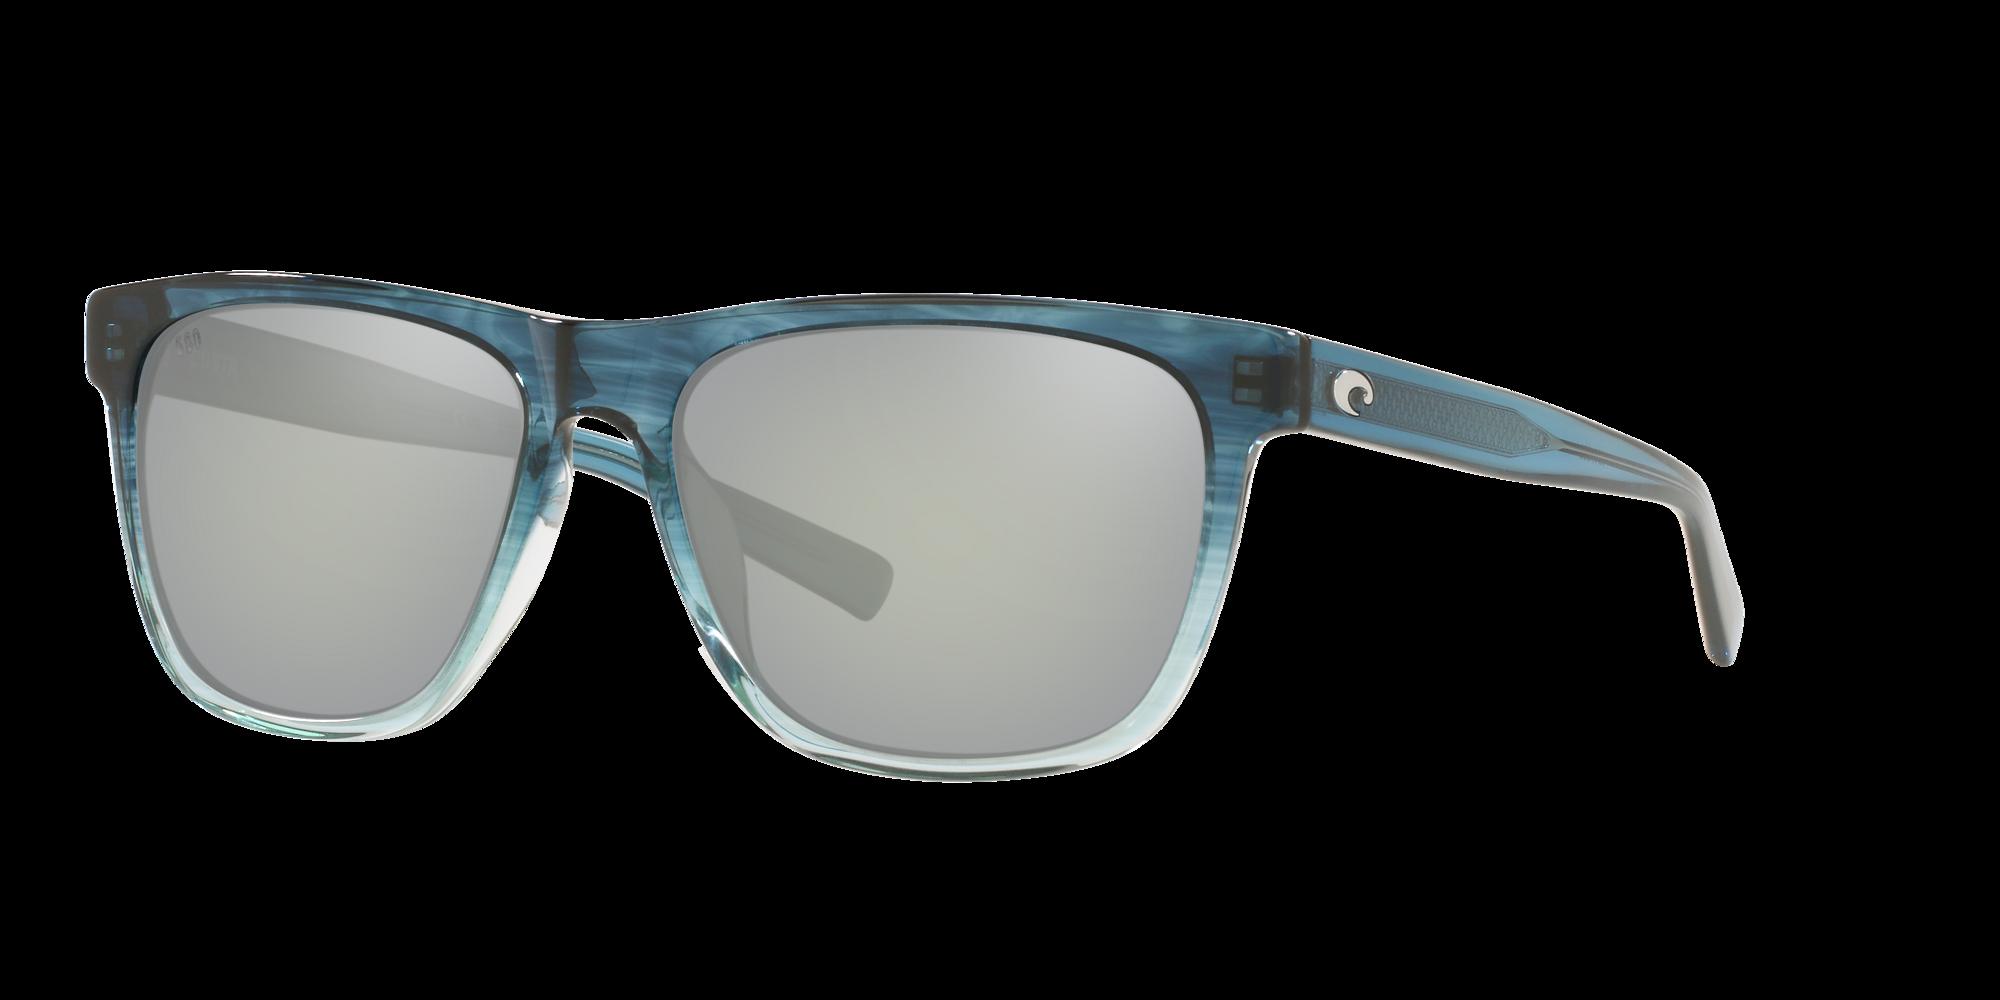 Costa Apalach Two Tone Plastic Frame Grey Lens Unisex Sunglasses APA238OGGLP